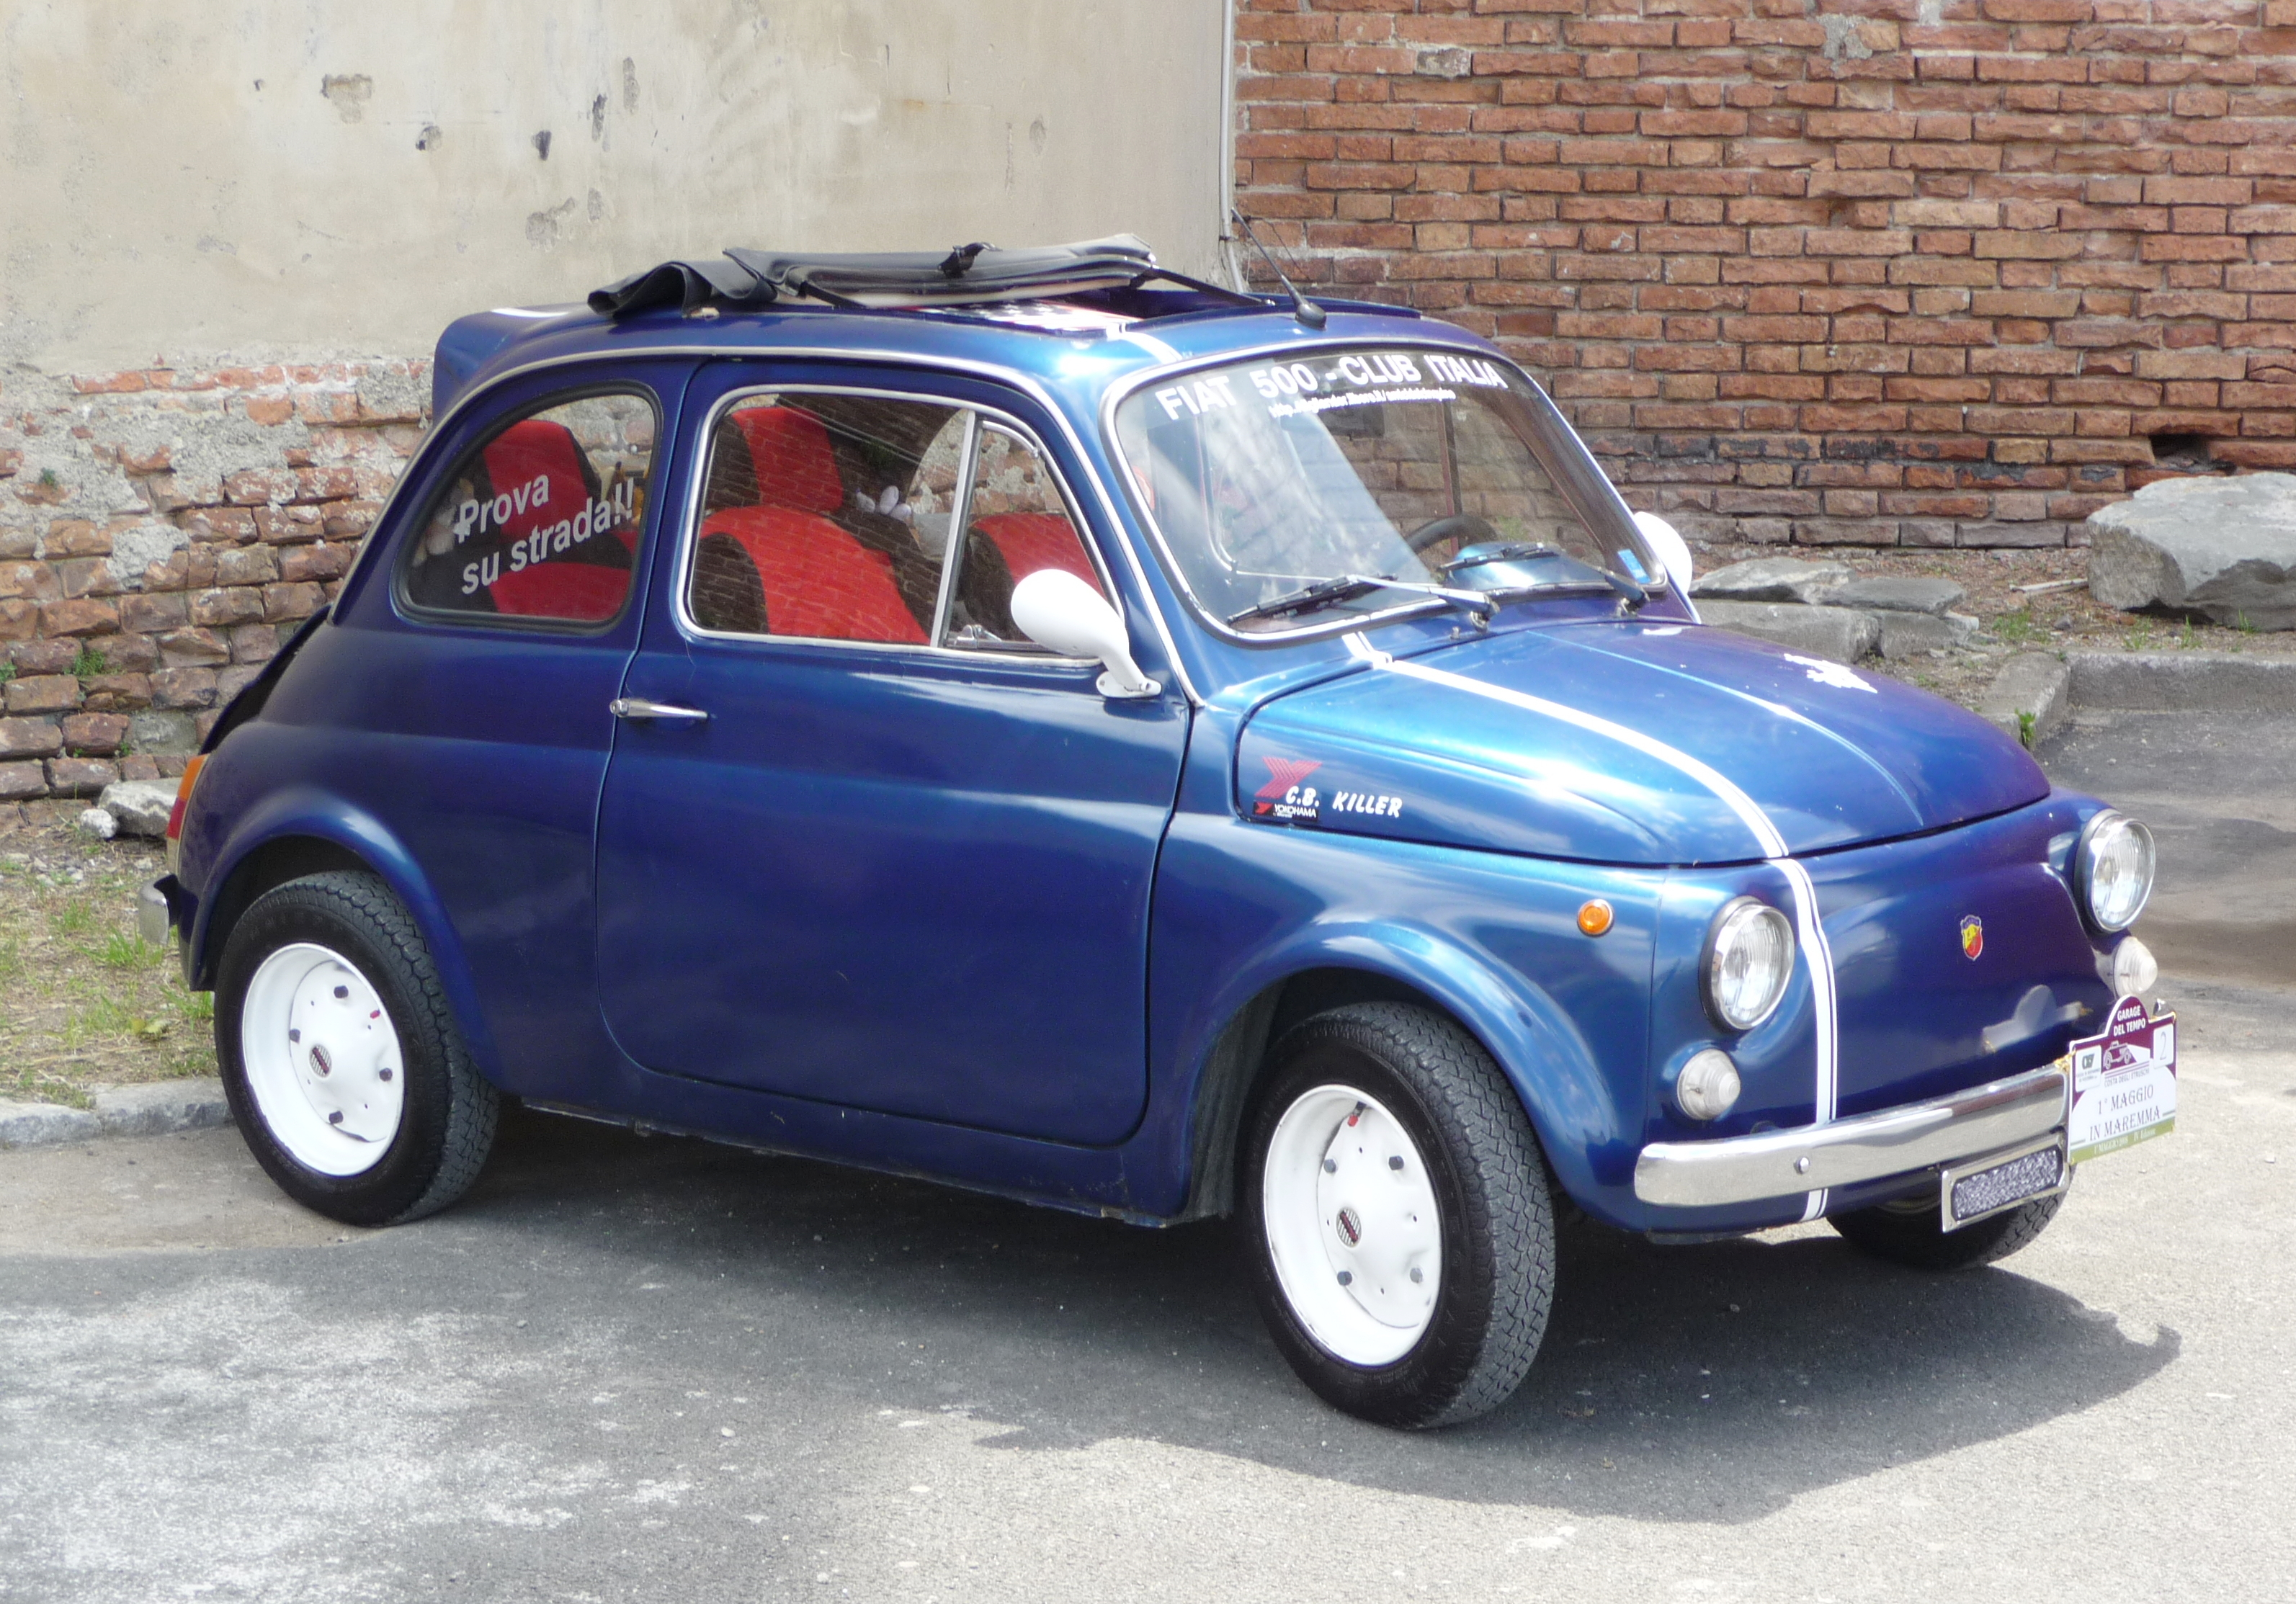 FIAT 500C blue